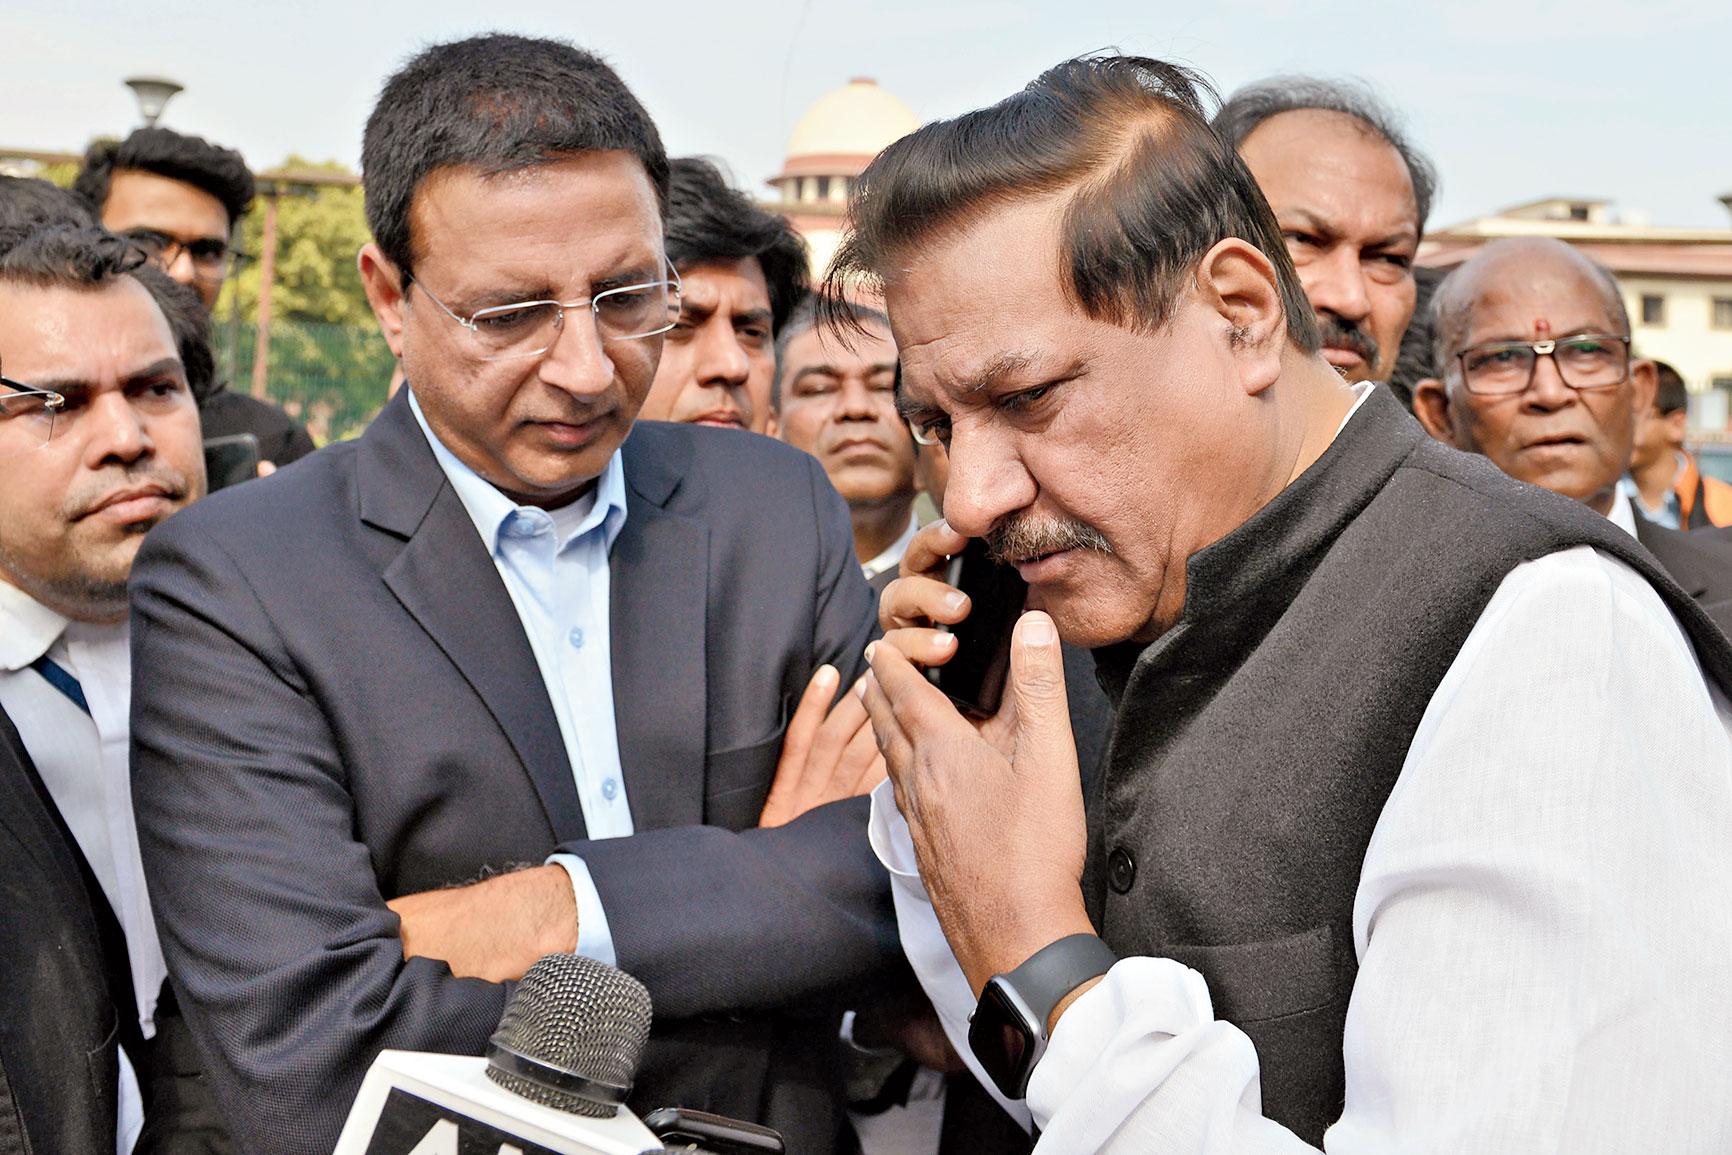 Congress leaders Randeep Surjewala and Prithviraj Chavan outside the Supreme Court on Sunday.